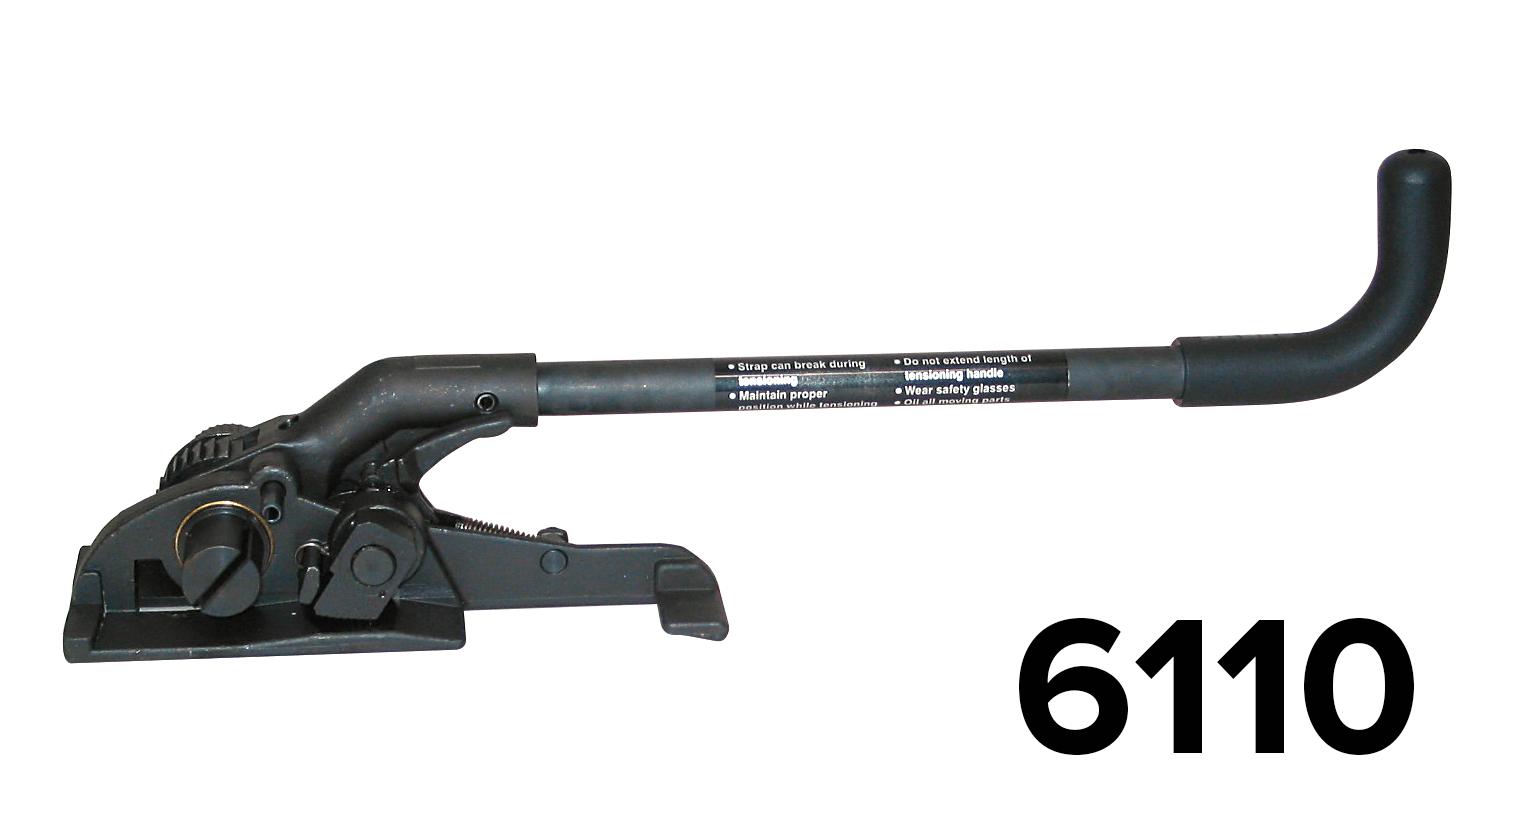 6110 xhd windlass tensioner product image